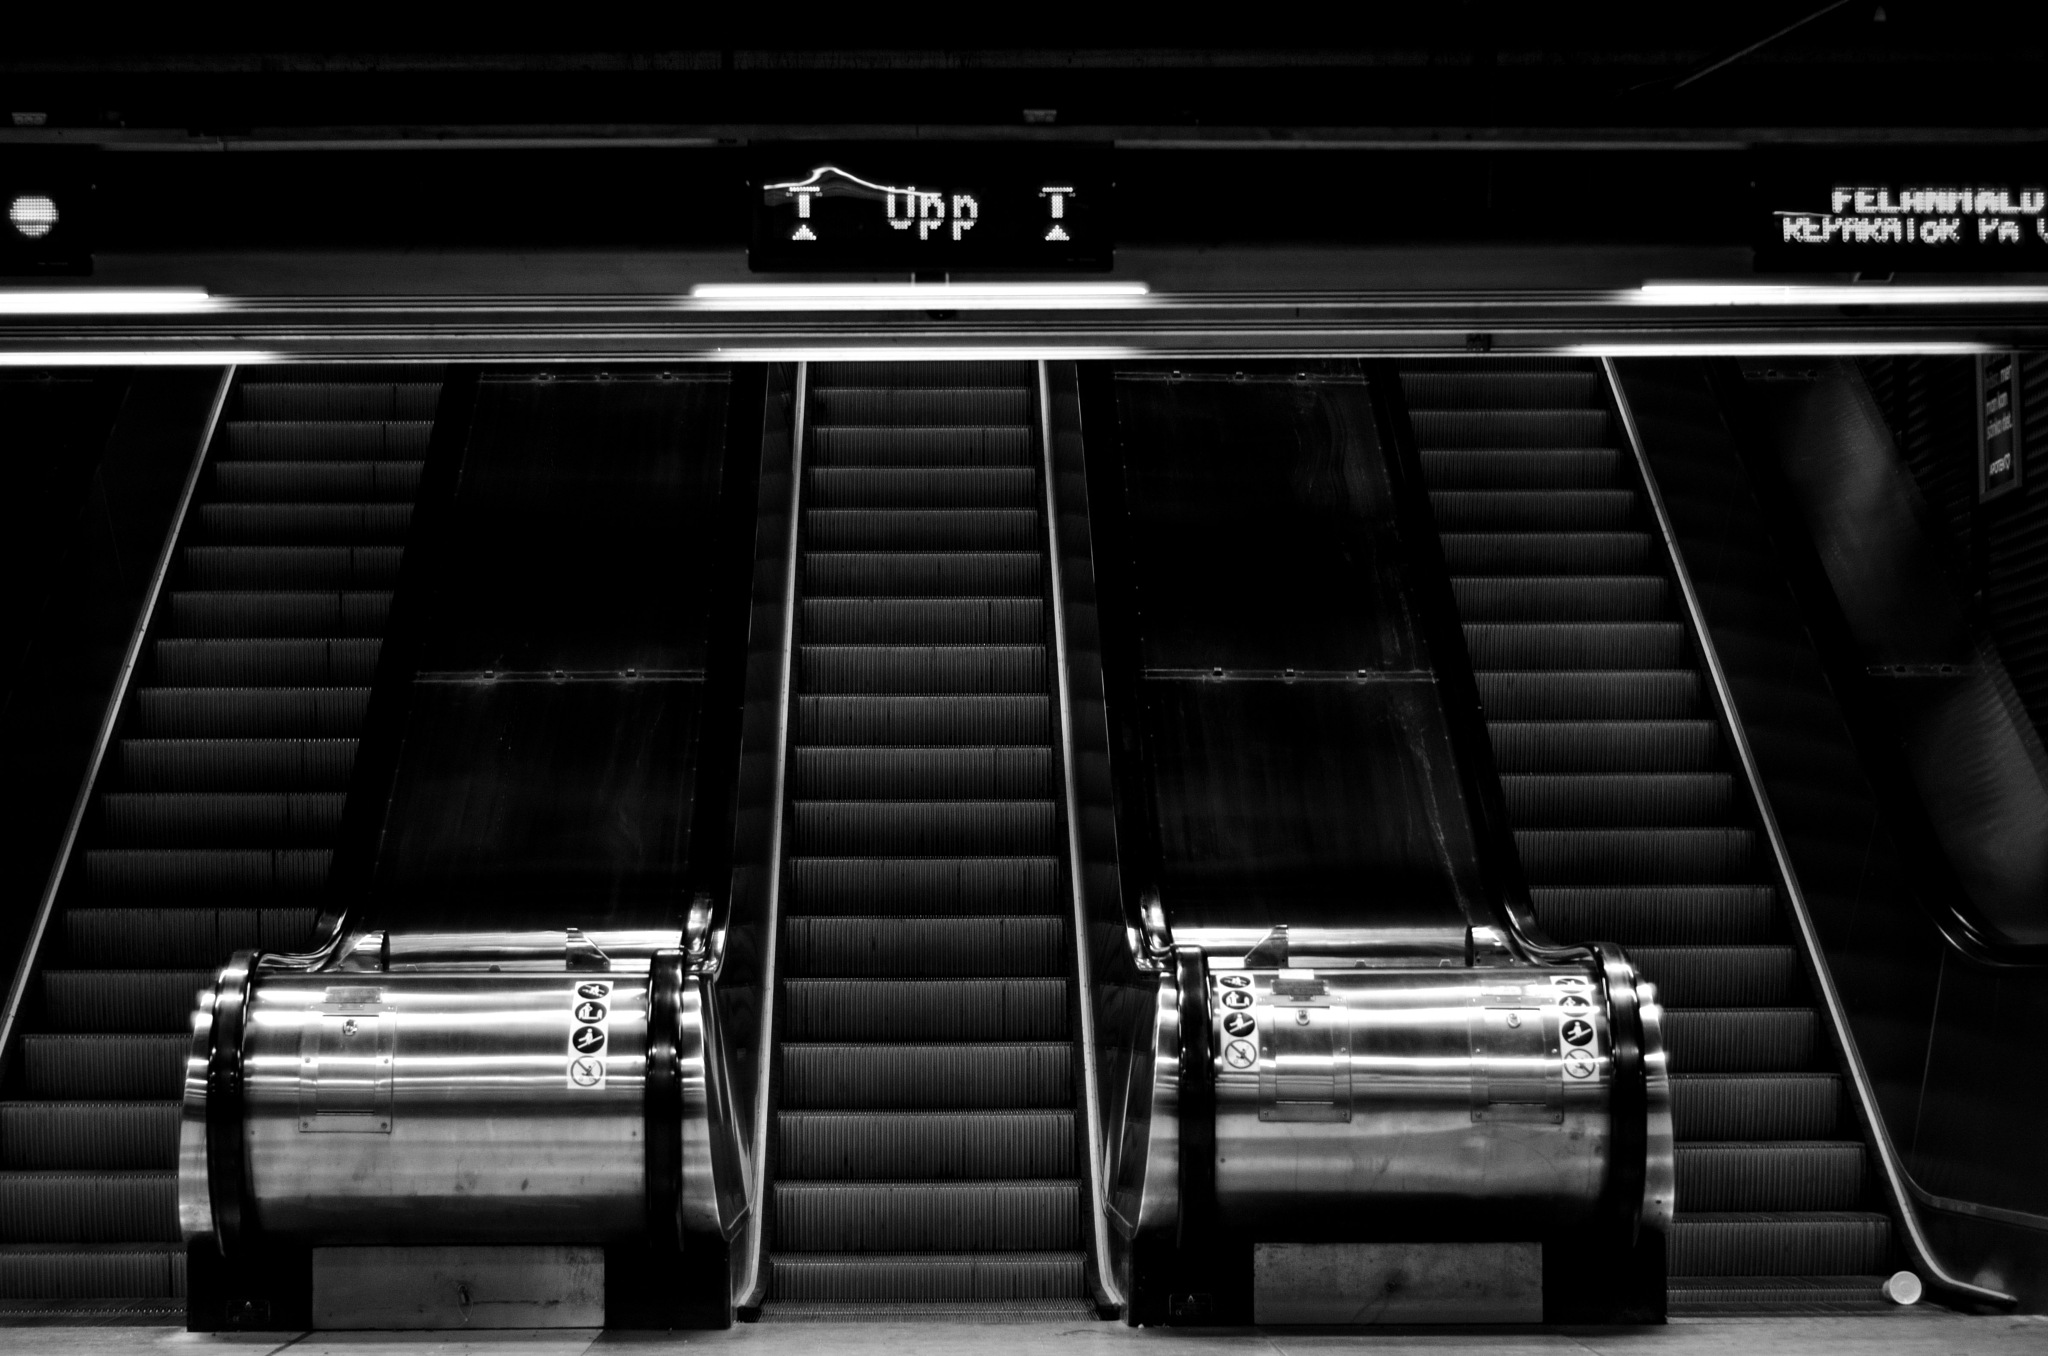 Escalators by Frederic Paulussen